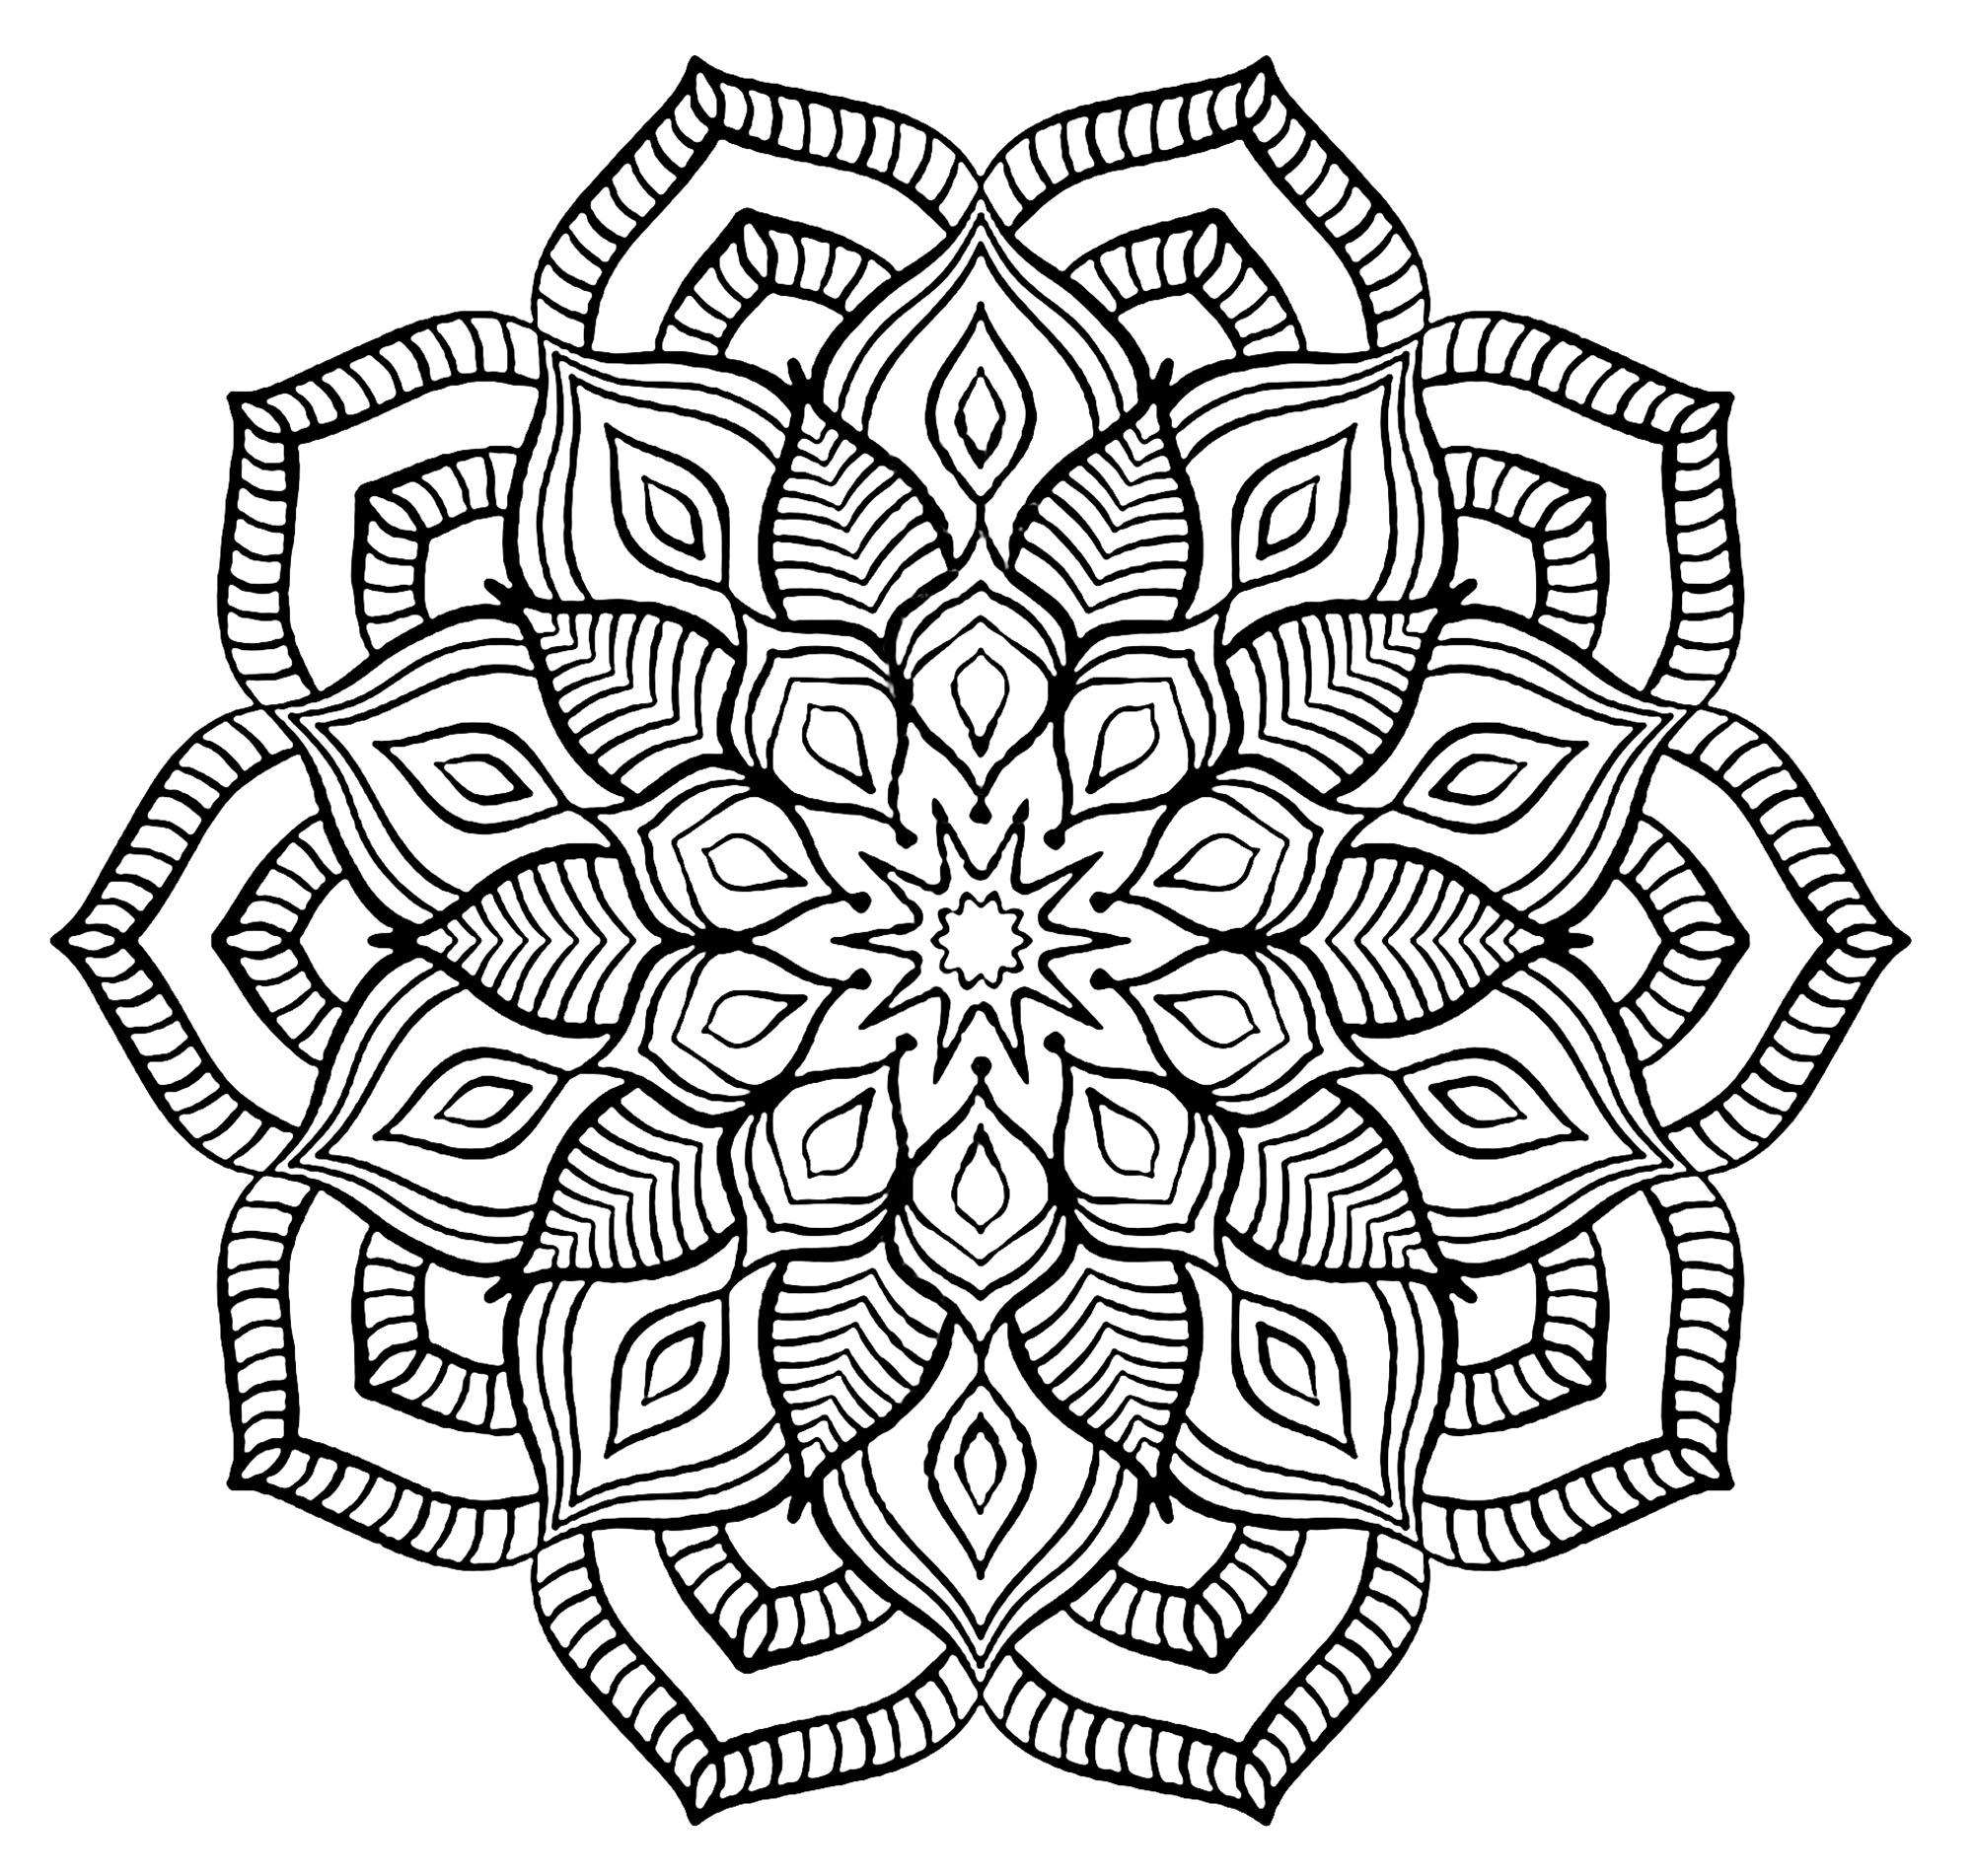 Coloriage Mandala Difficile Fleur.Mandala Grosse Fleur Mandalas Difficiles Pour Adultes 100